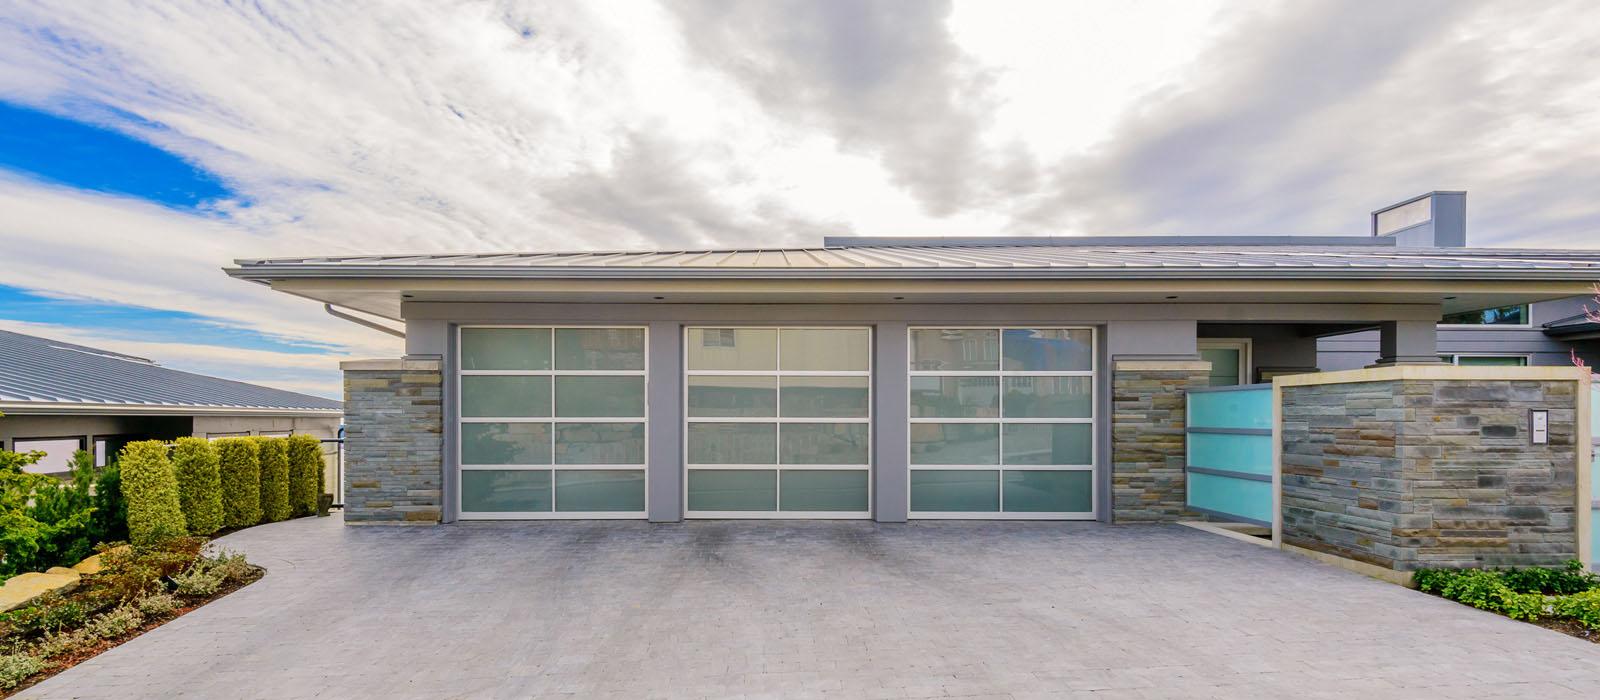 Gdr Garage Door Repair Long Beach Ca Installation 562 800 0606